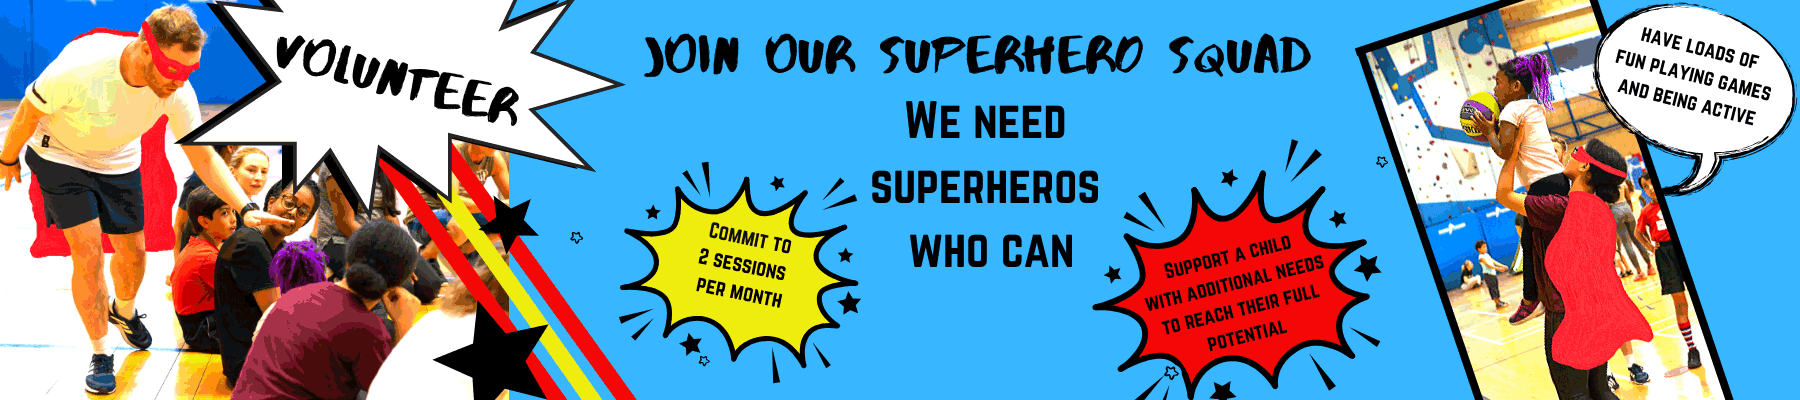 We need Superheros!